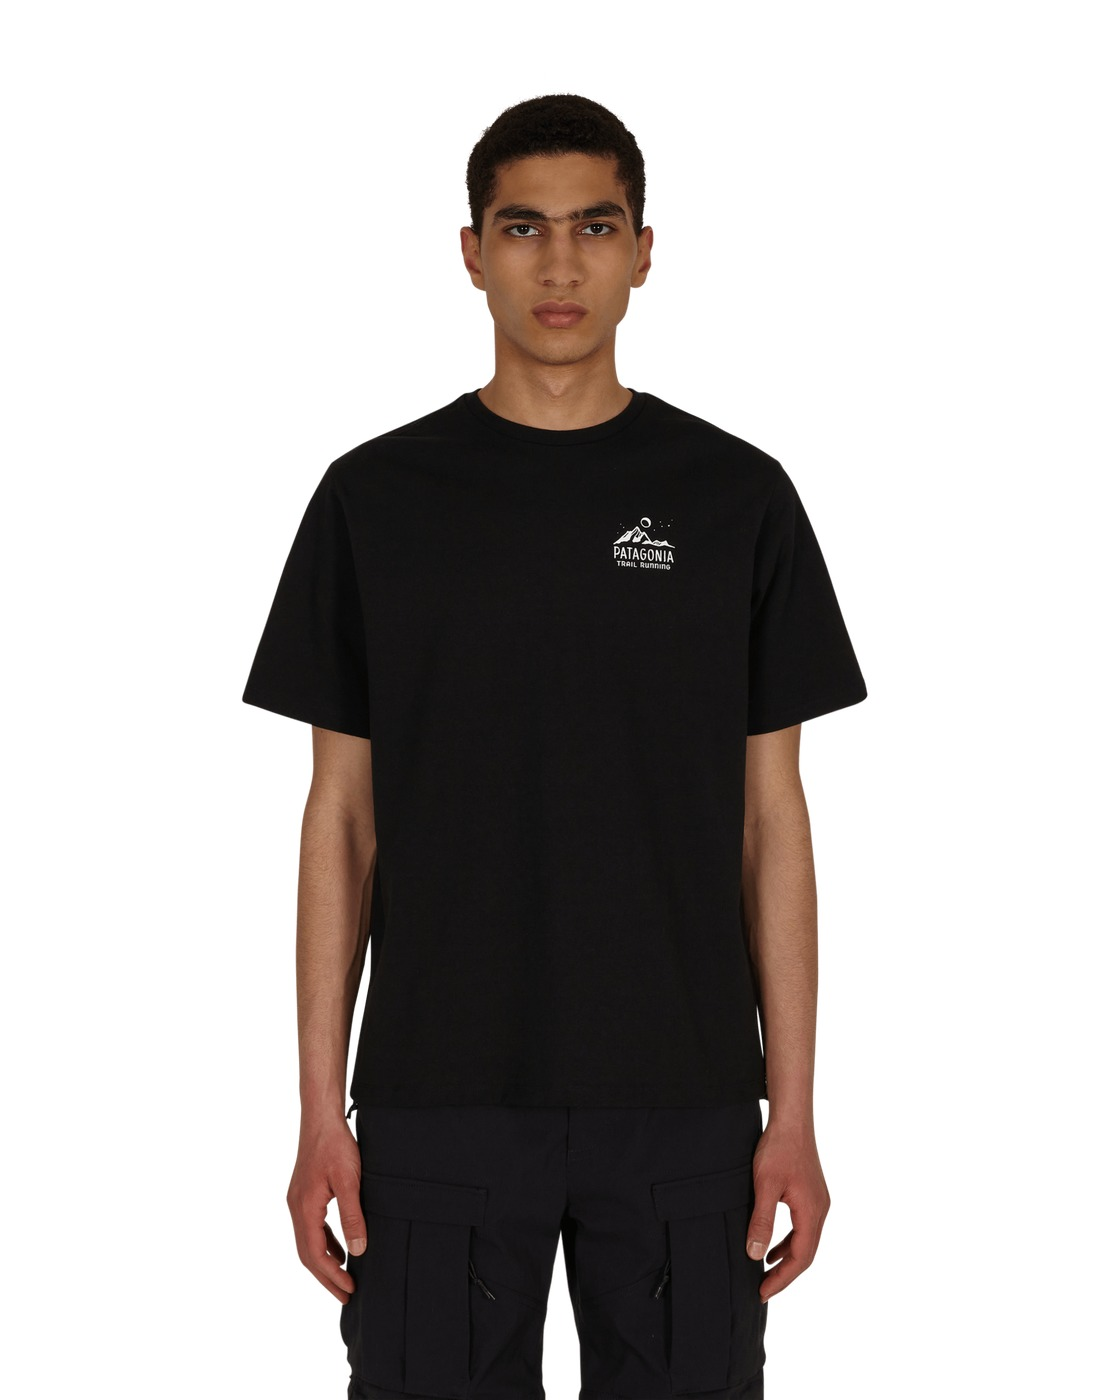 Photo: Patagonia Ridgeline Runner Responsibili T Shirt Black